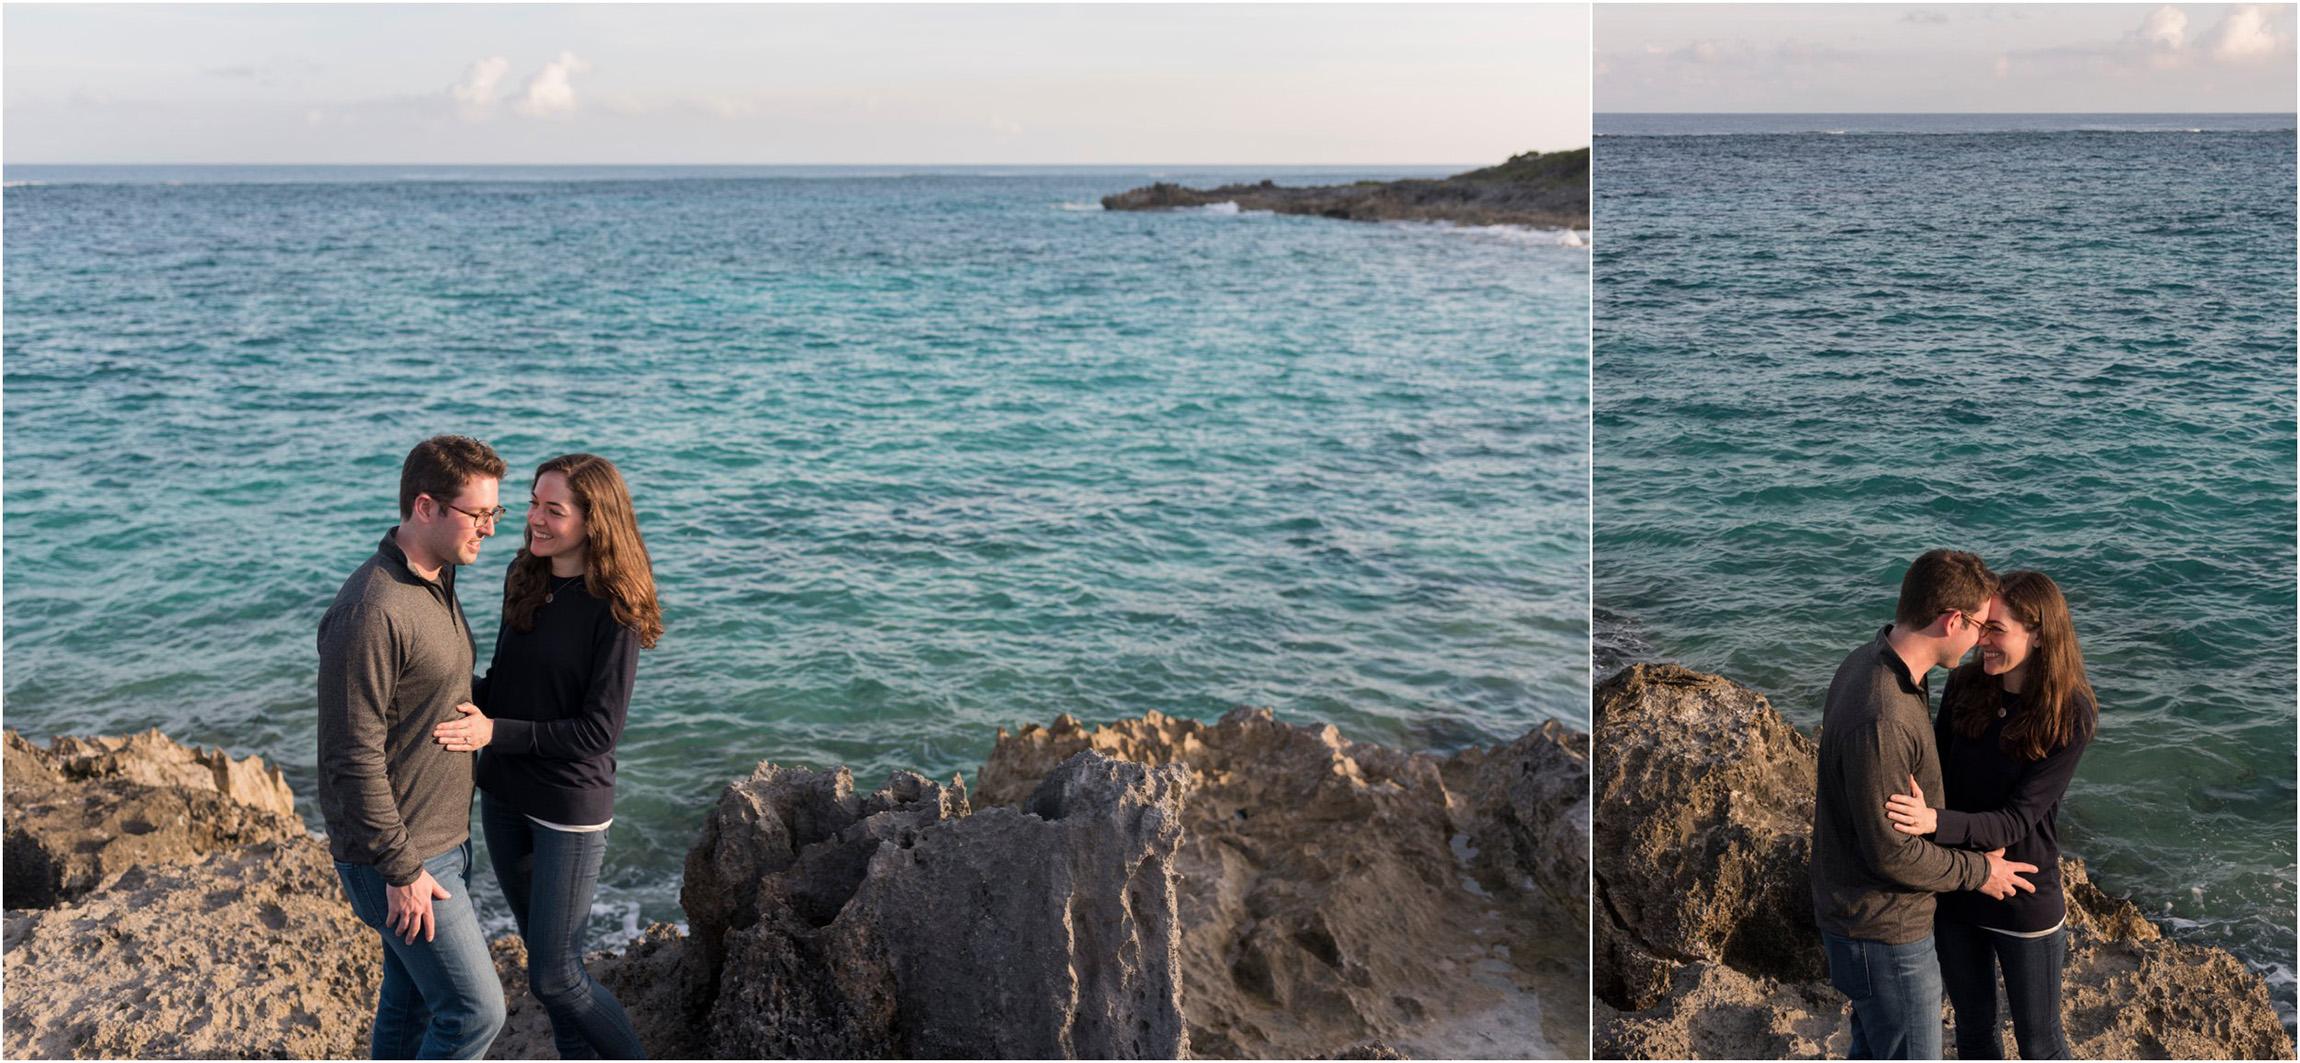 ©FianderFoto_Bermuda_Proposal_Mark_Sarah_007.jpg